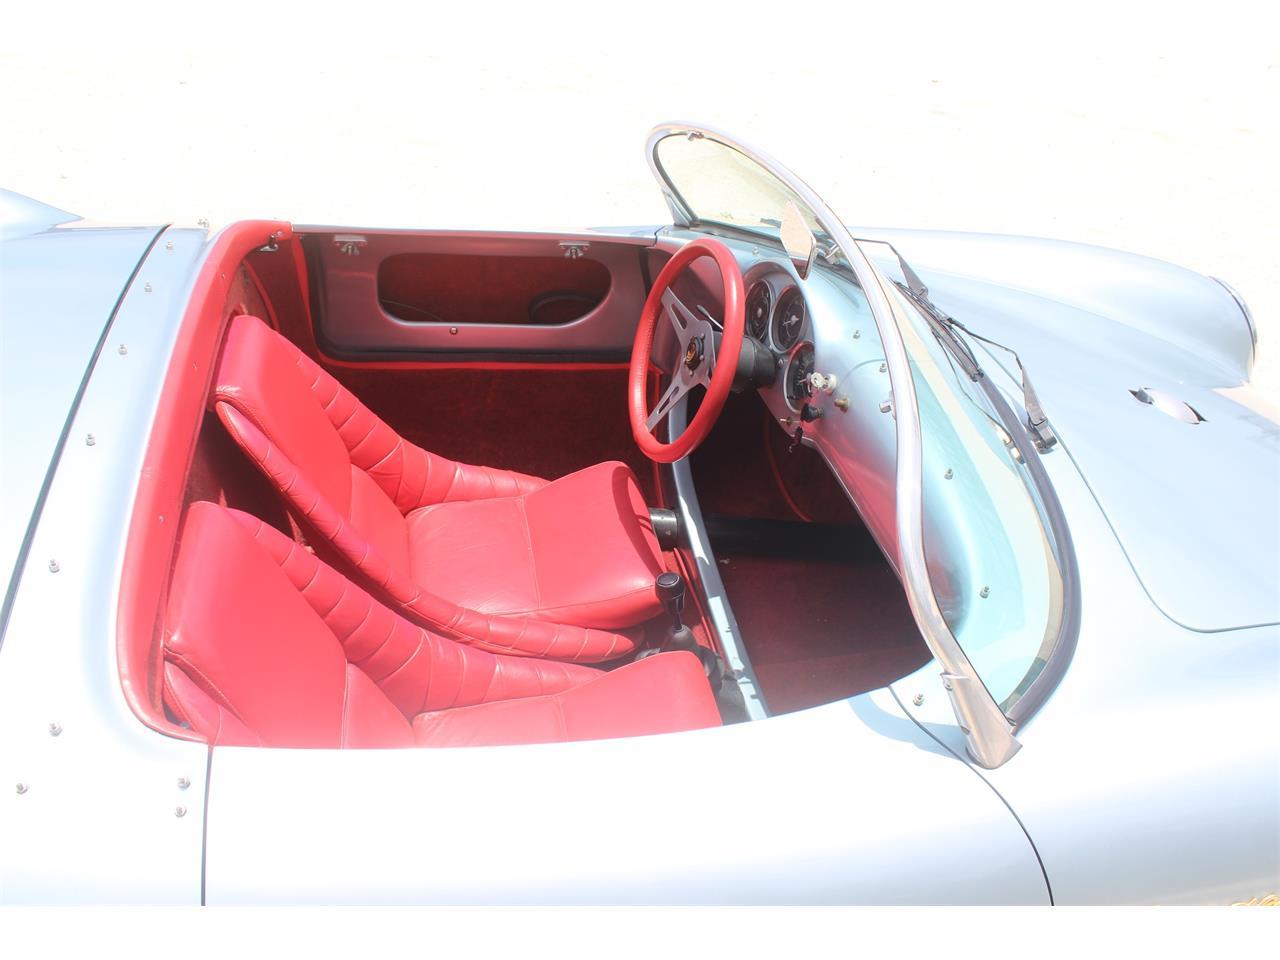 Large Picture of Classic 1955 Porsche 550 Spyder Replica located in Florida - $32,500.00 - FC5F